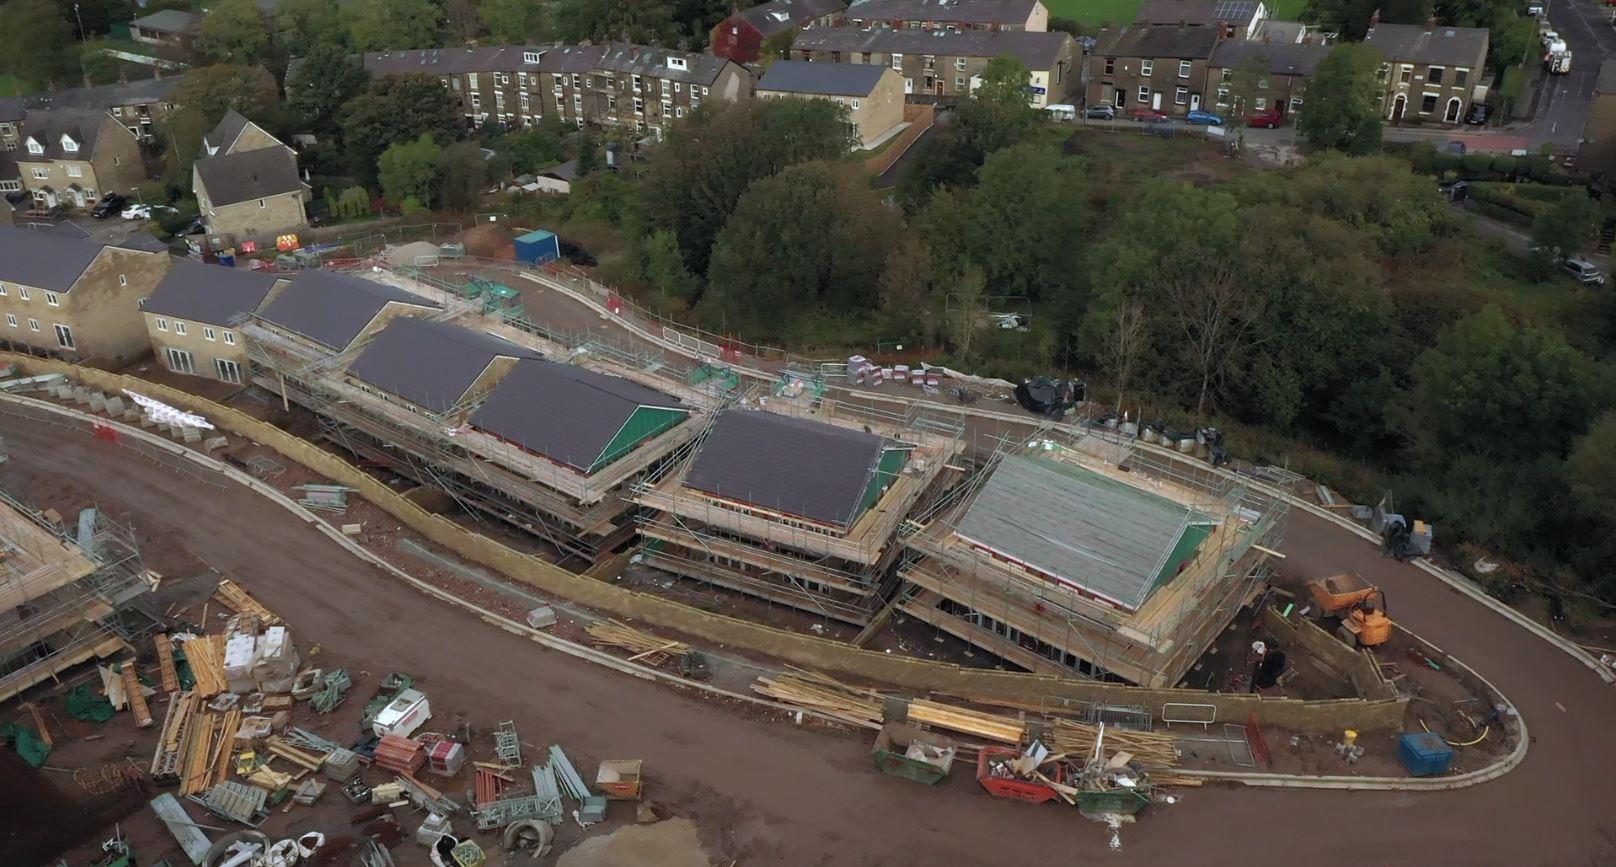 Building Site Progress Aerial Inspection by Drone Site Surveys